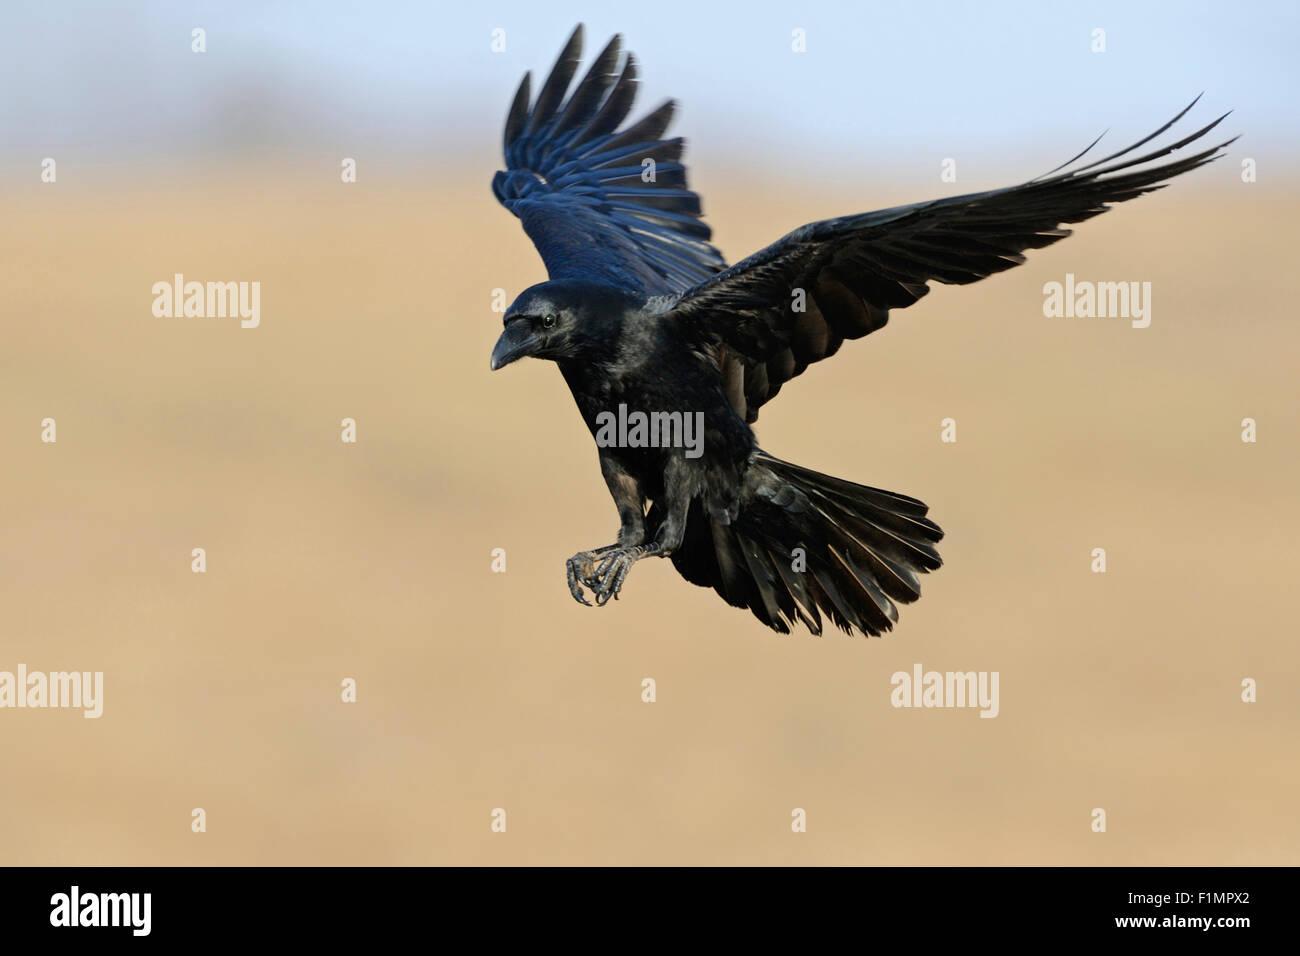 Wunderbare Corvus Corax / gemeinsame Raven / Kolkrabe fliegen. Stockbild